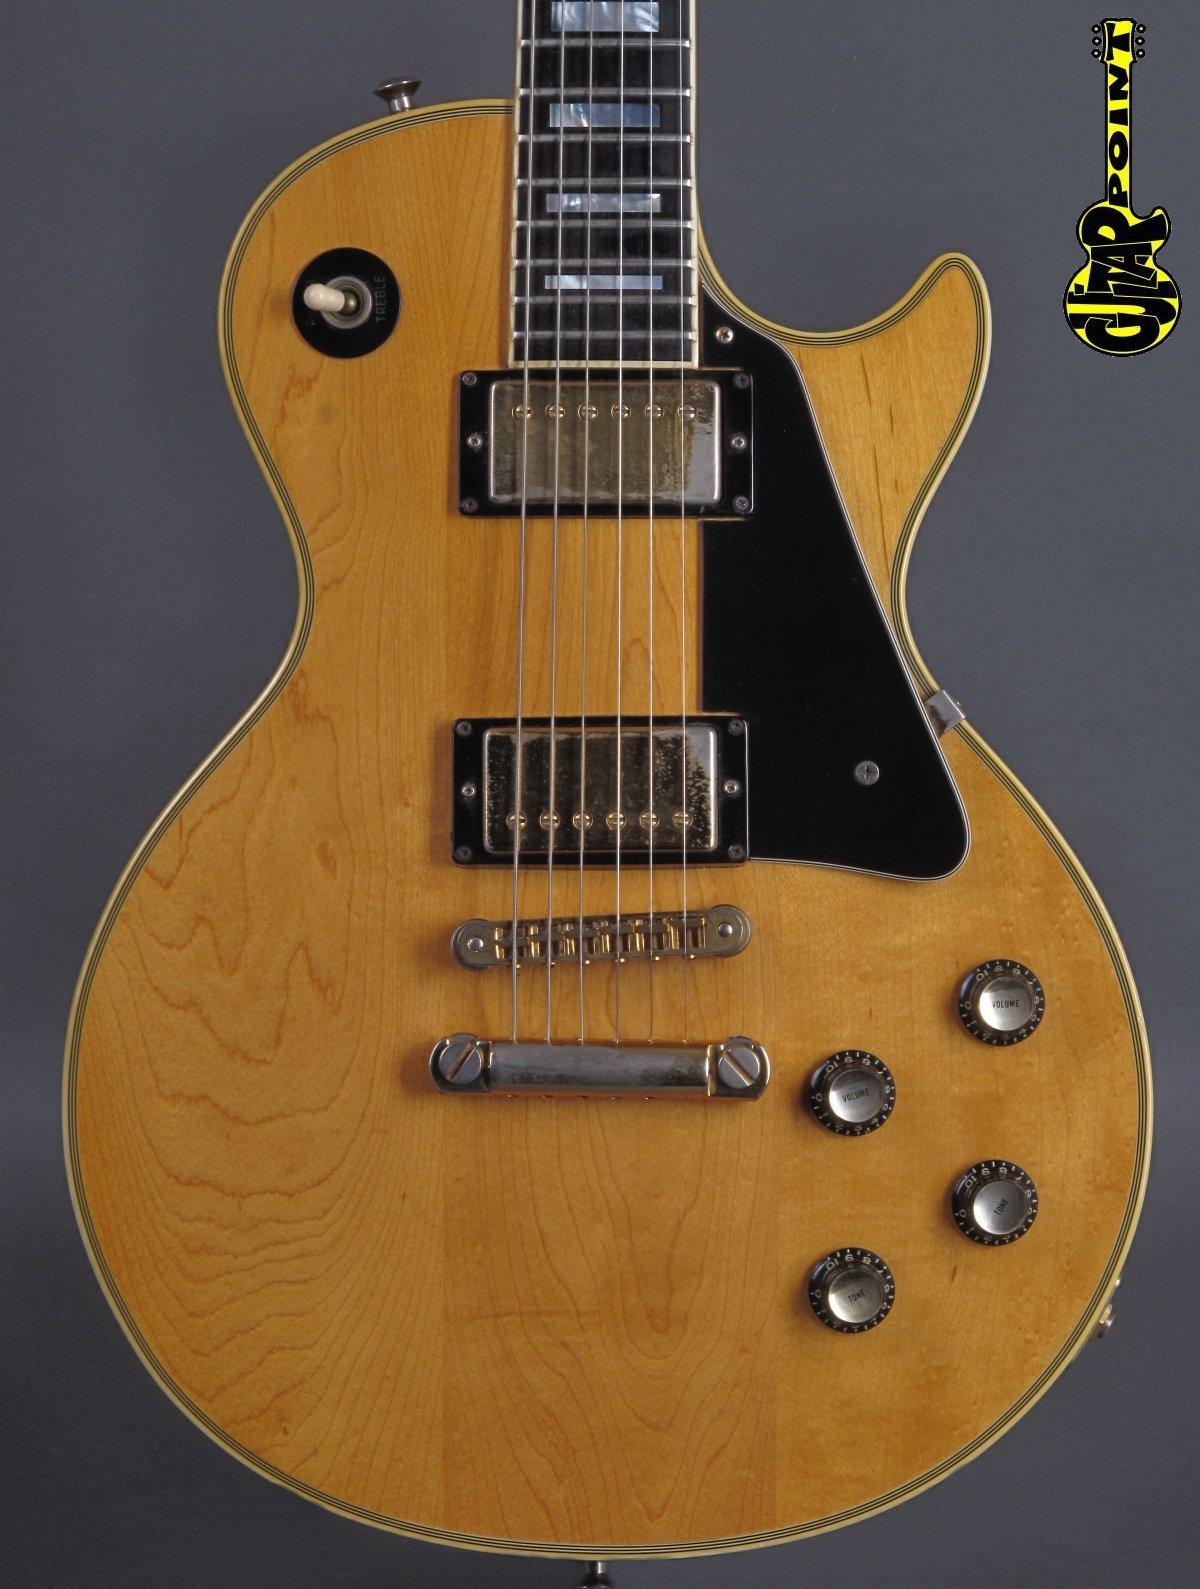 1978 Gibson Les Paul Custom - Natural